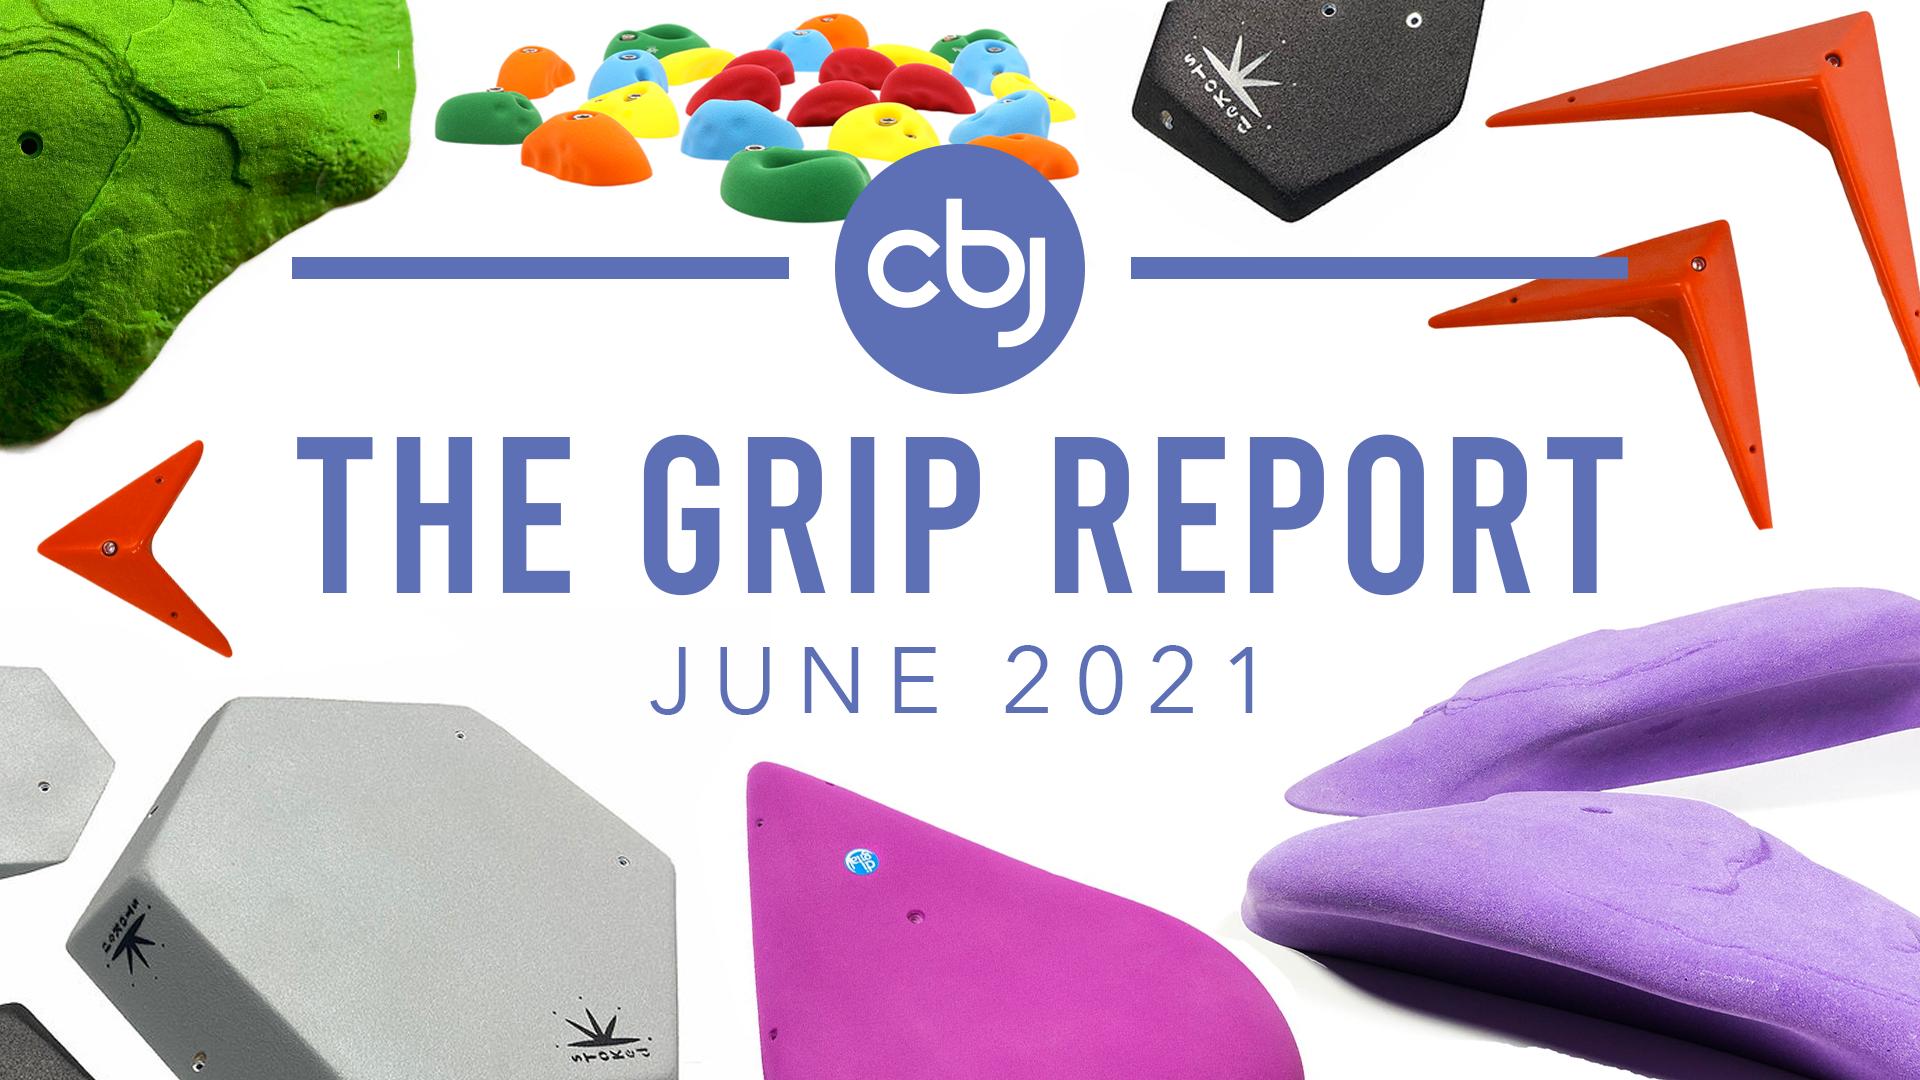 The Grip Report: June 2021